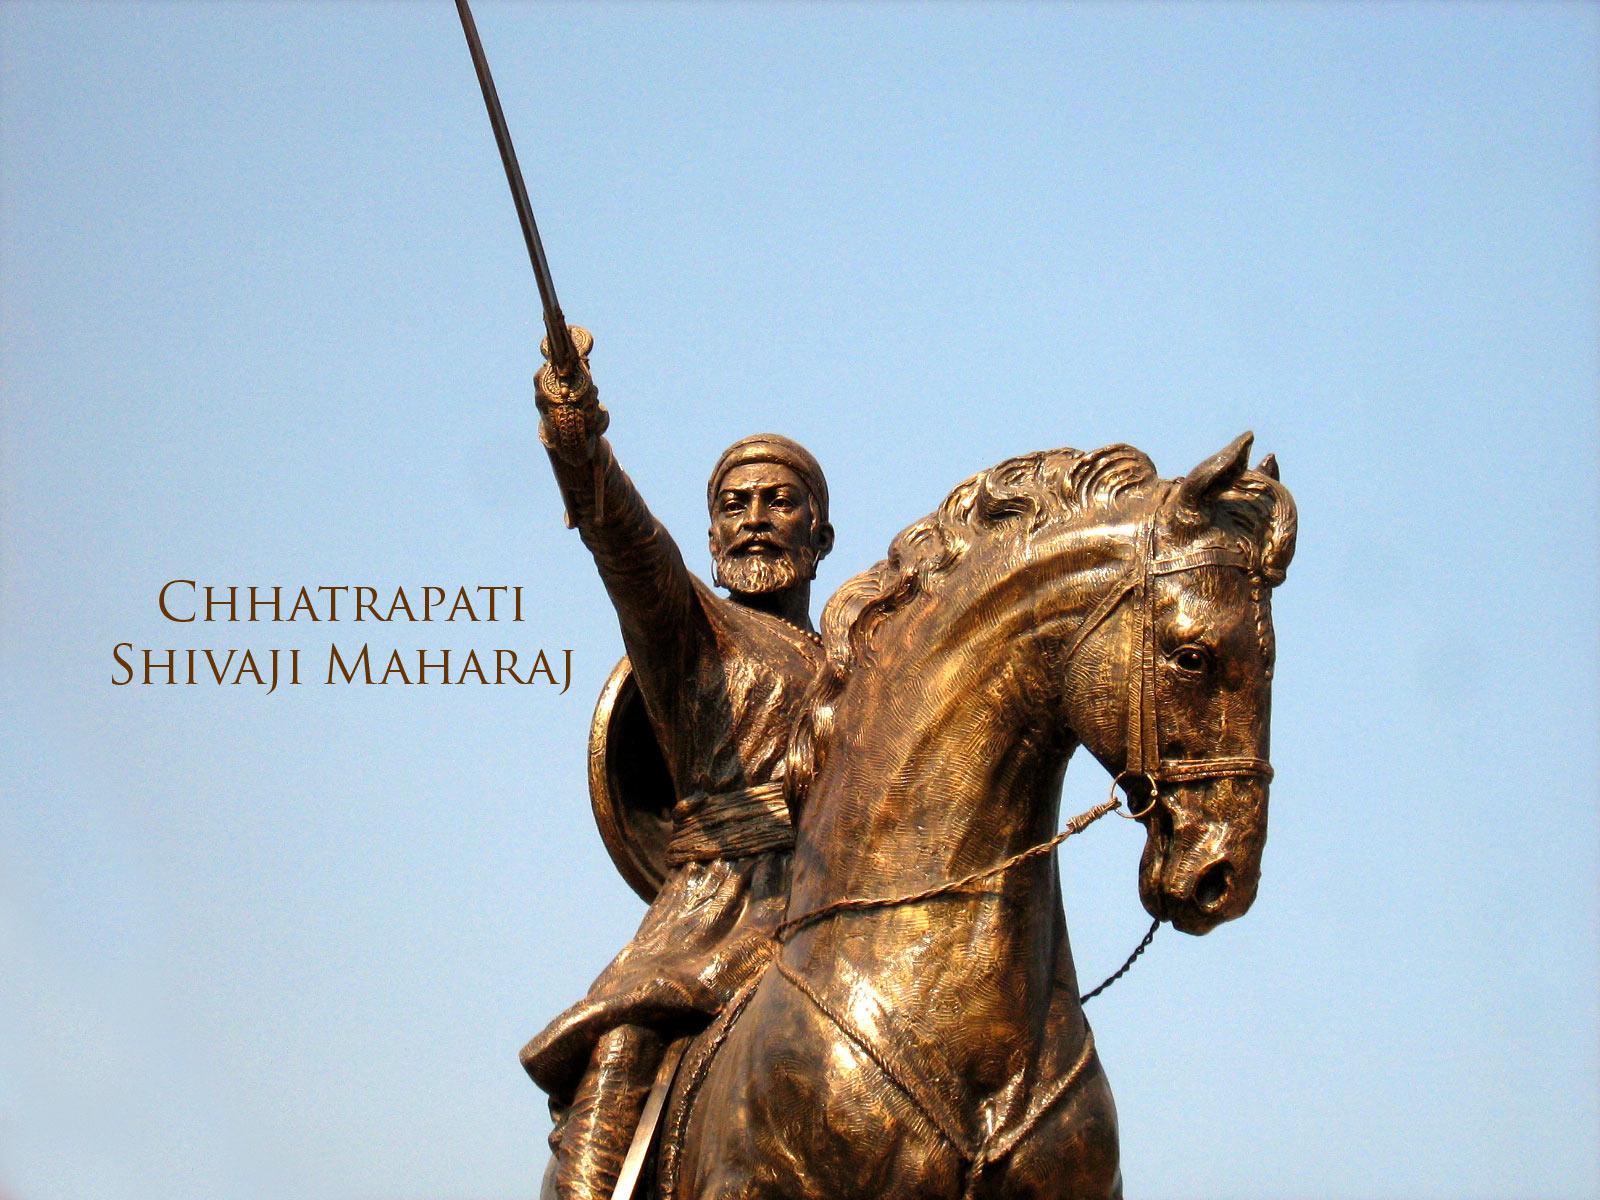 Hd images of shivaji maharaj for pc